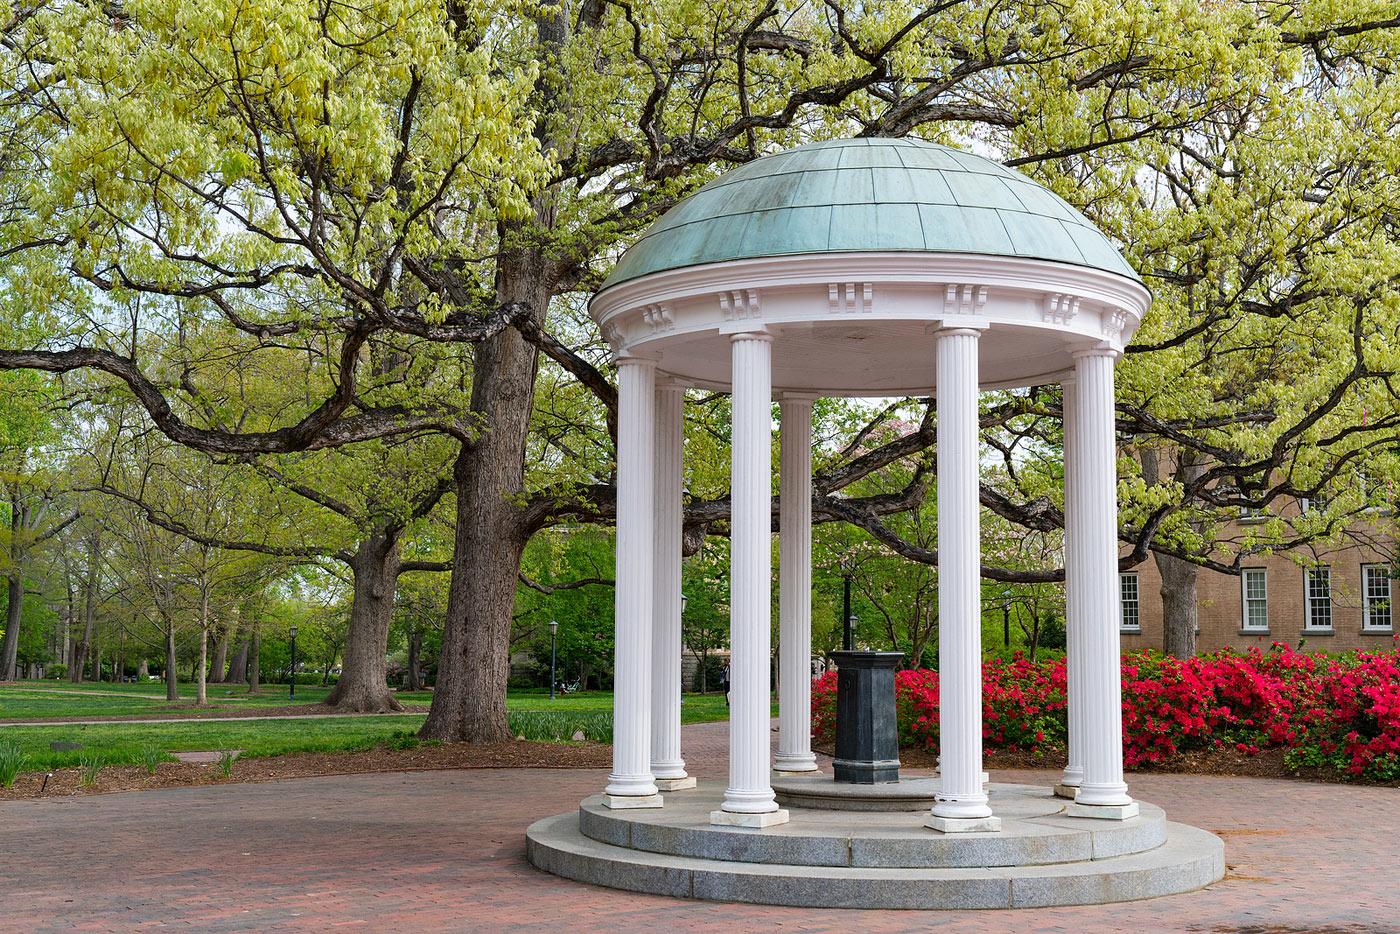 Chapel Hill property management